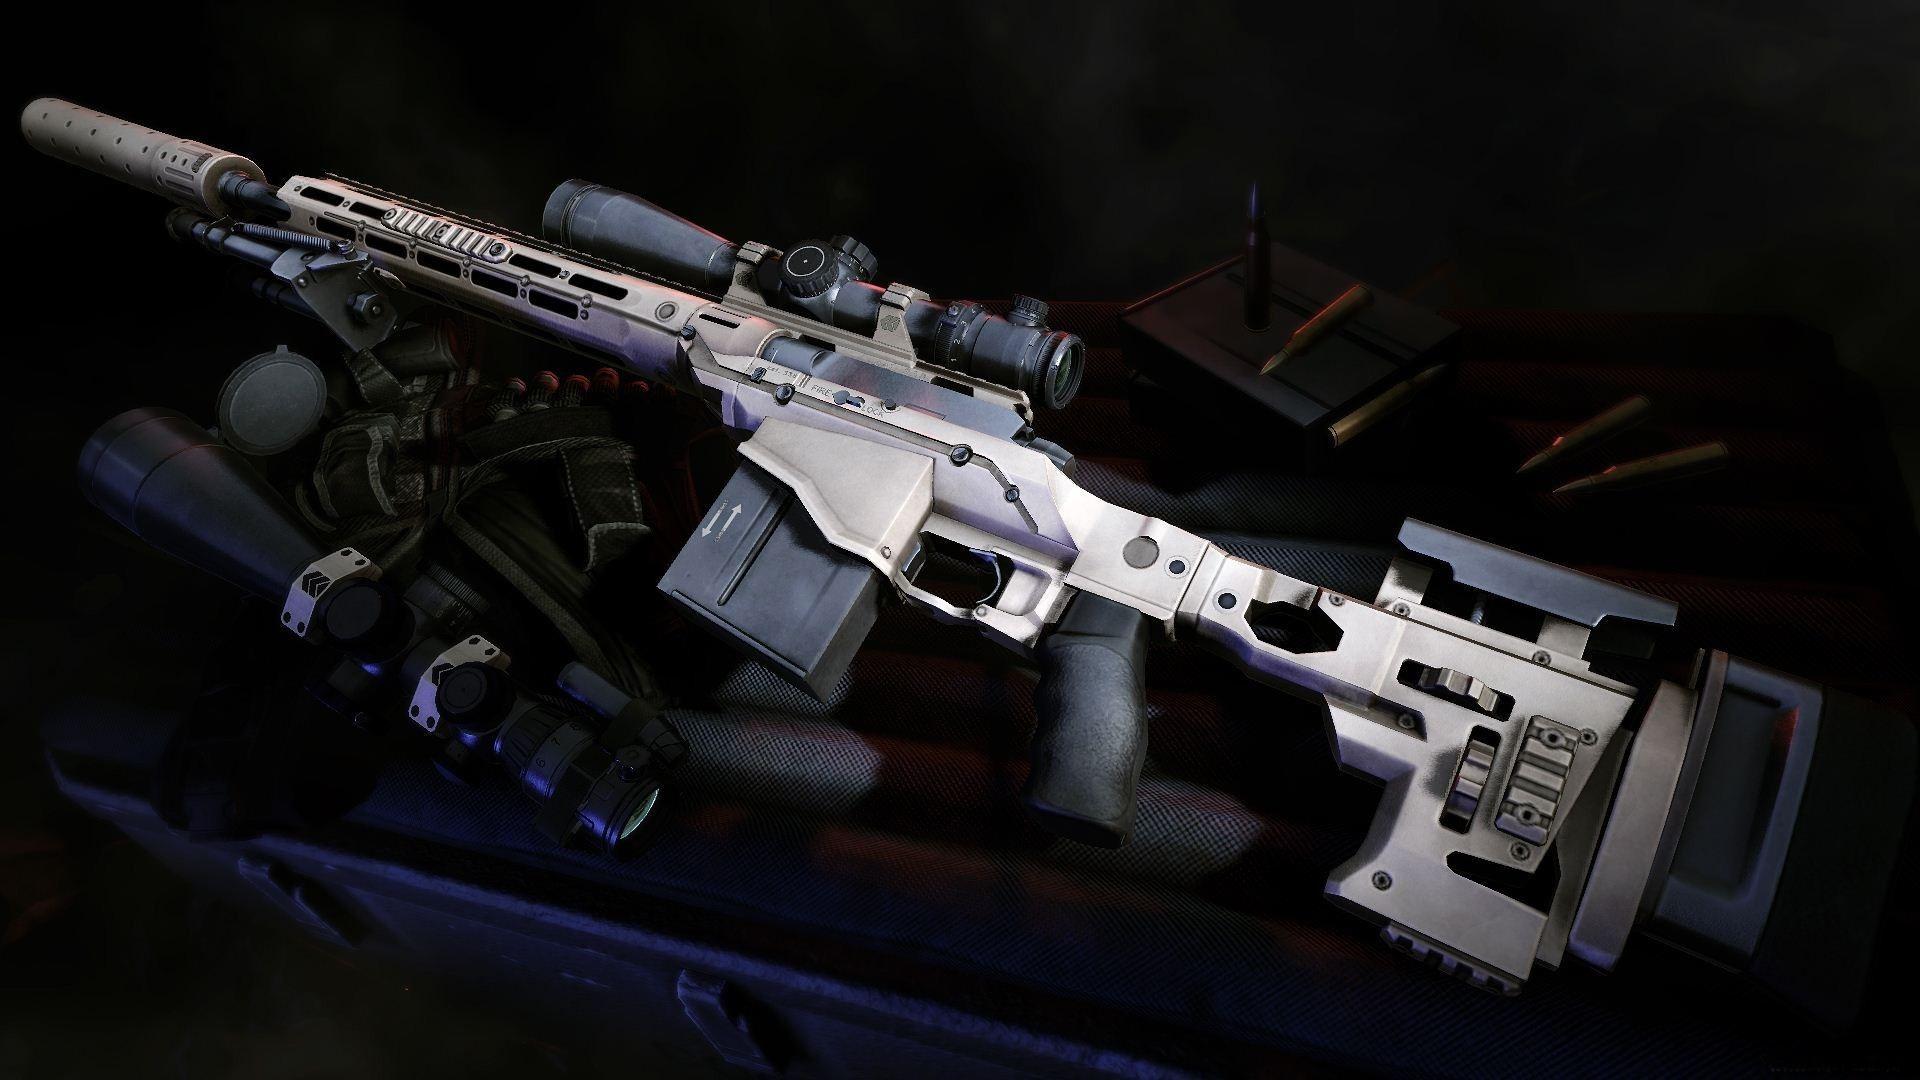 13 HD Sniper Rifle Guns Wallpapers   HDWallSourcecom 1920x1080